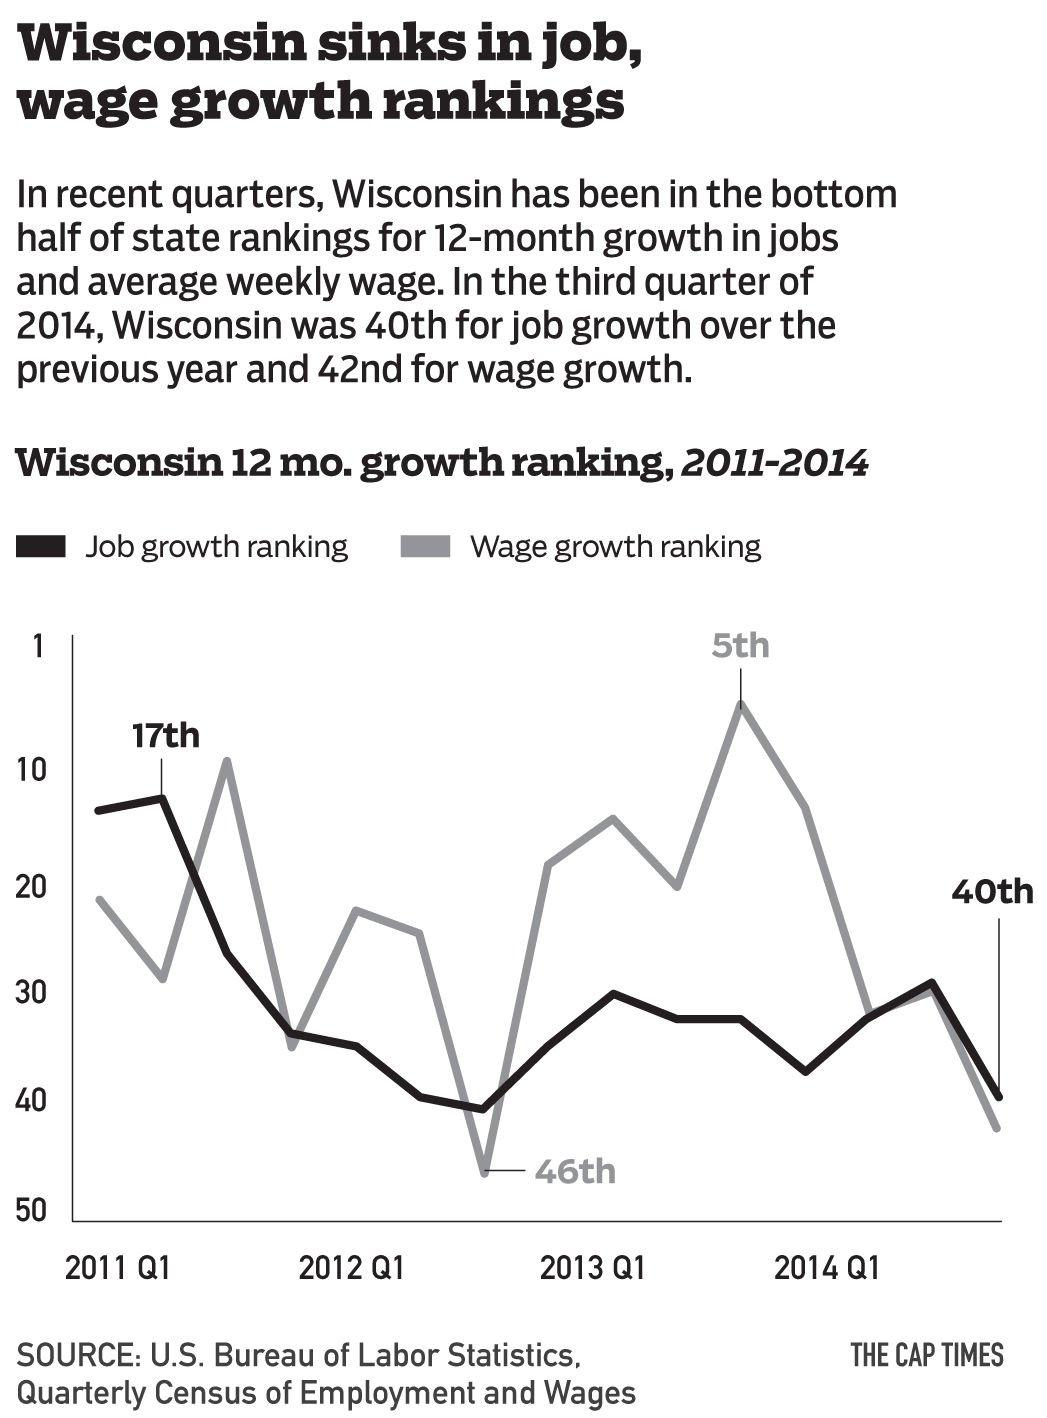 Wisconsin wage growth